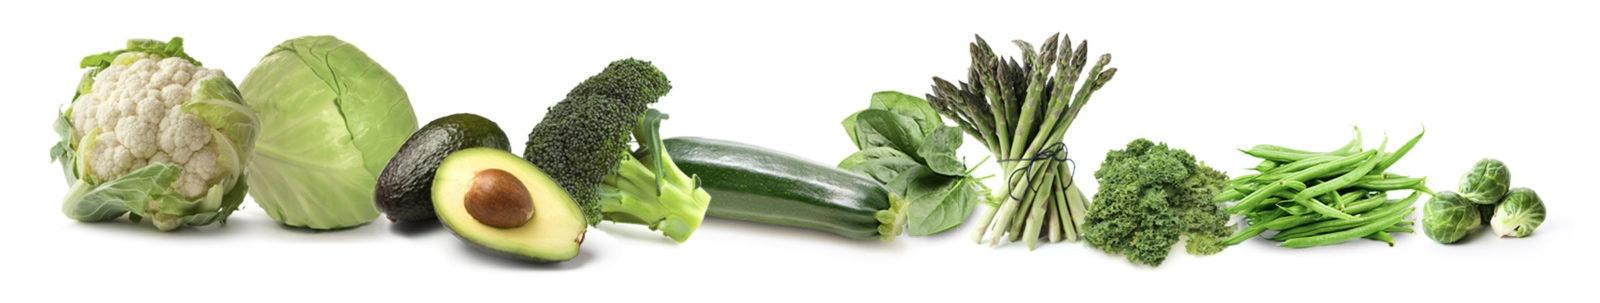 harry kuvert grönsak